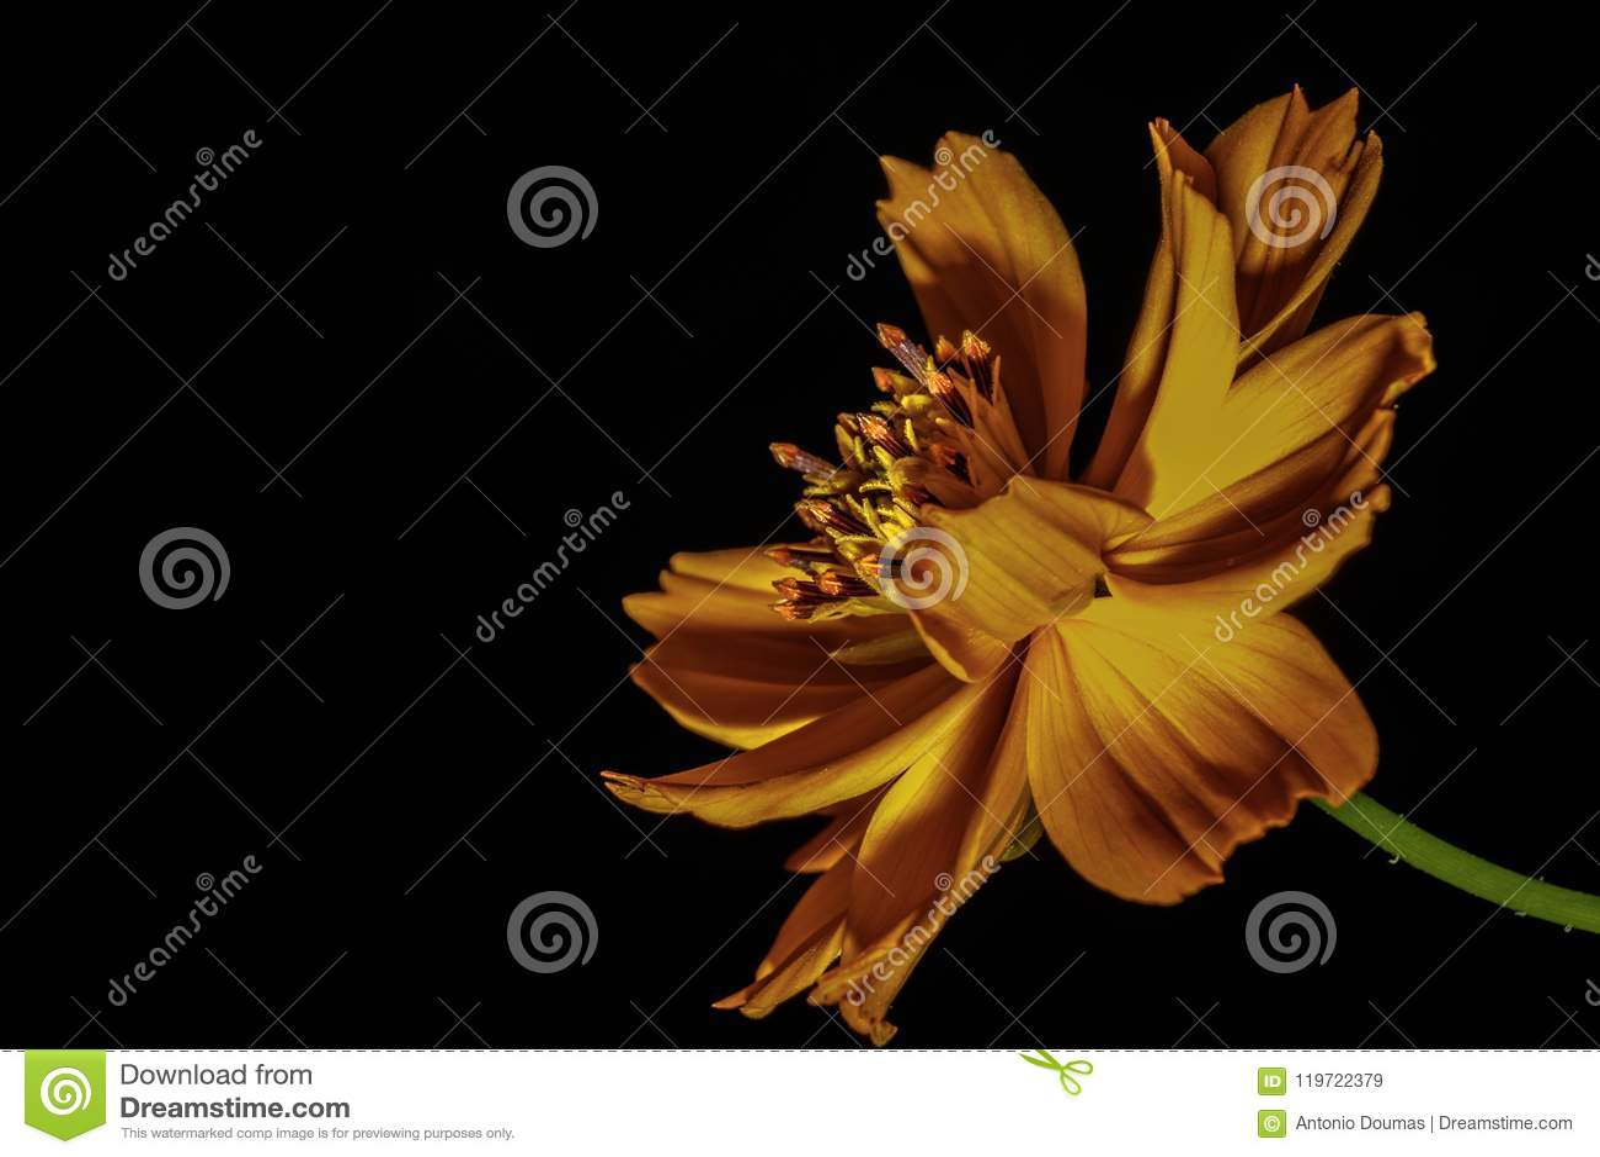 Orange Flower In The Dark Stock Image Image Of Warps 119722379